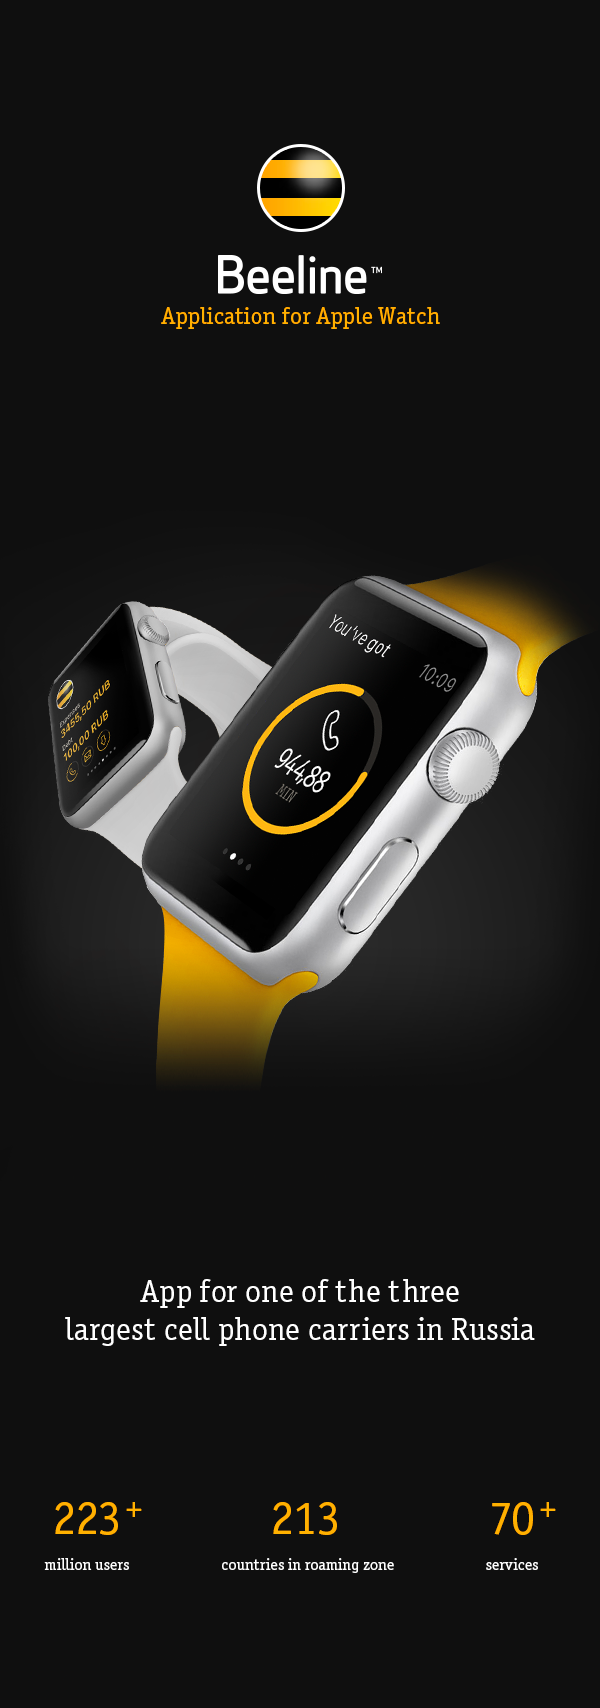 apple watch watch user interface user Experience smart watch beeline mobile redmadrobot iwatch app wear apple